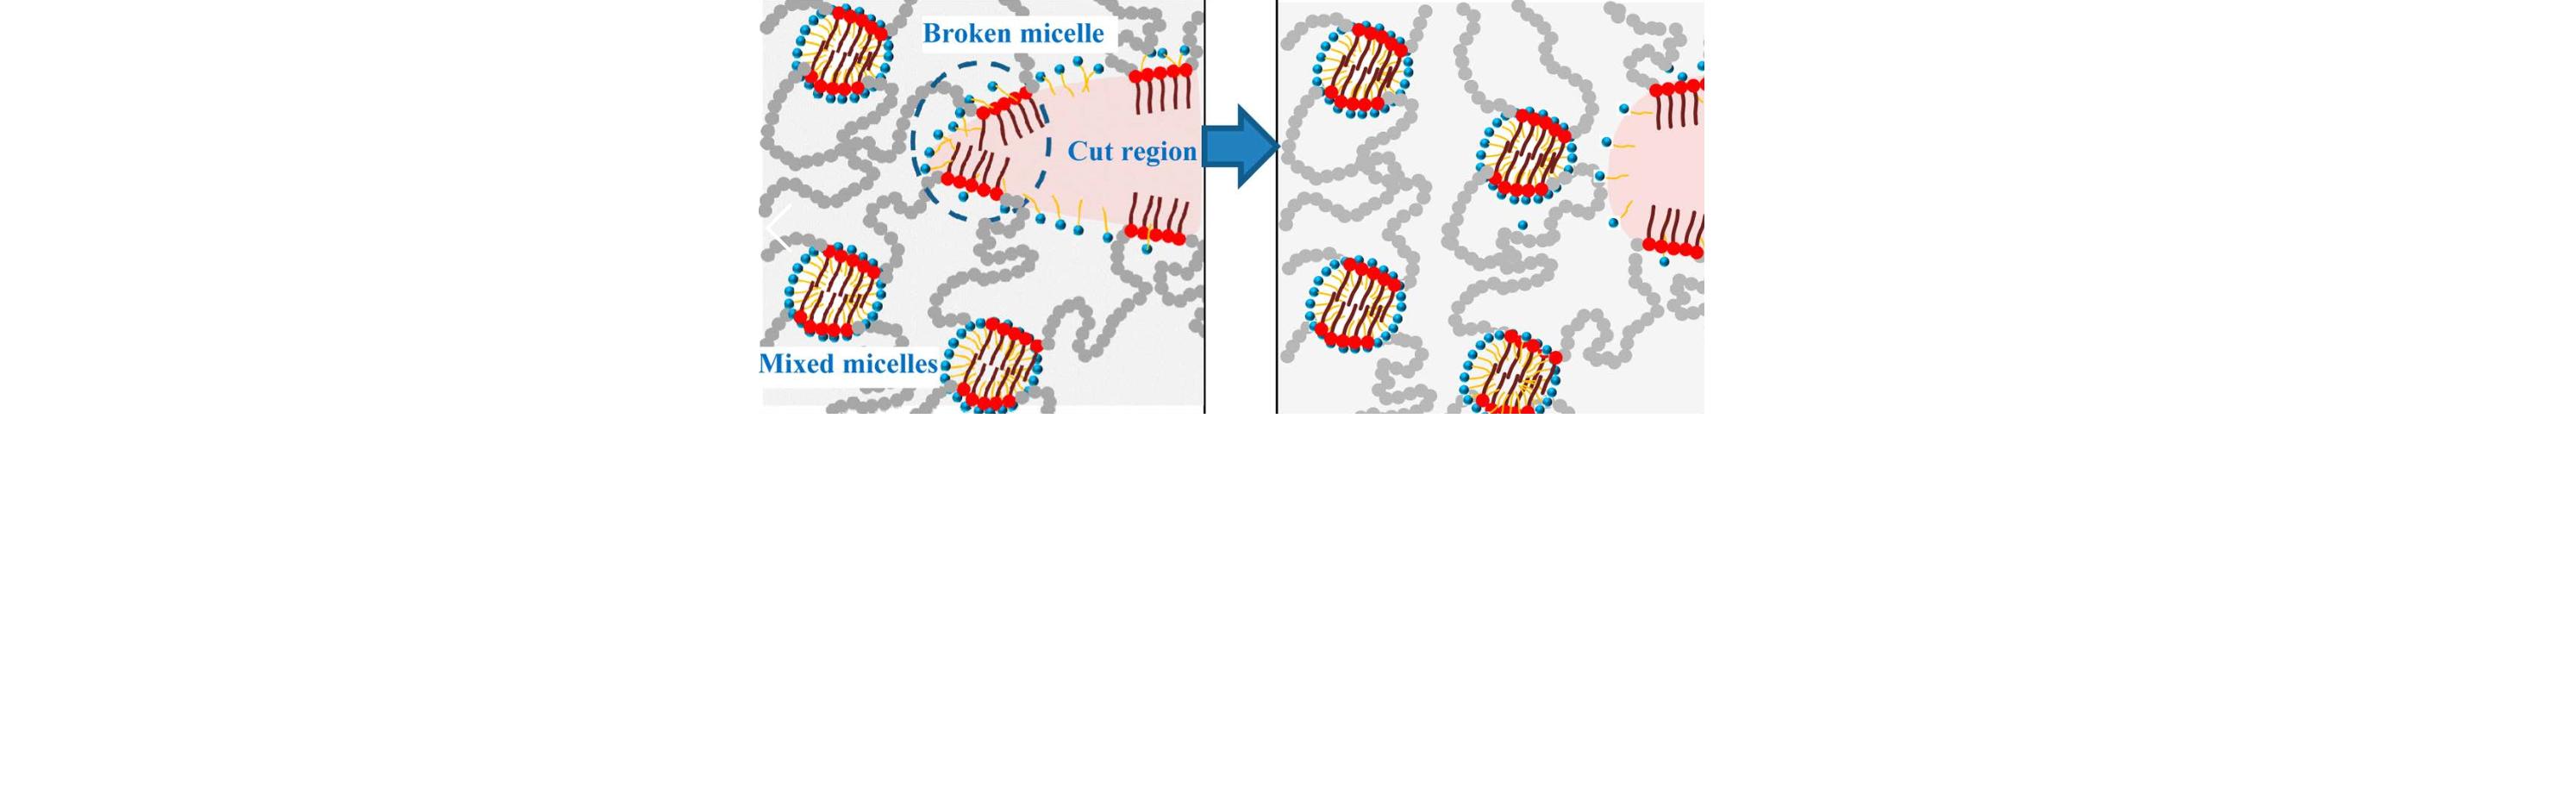 Macromolecules_nanostructure_self_heal_micellar_hydrogels.png